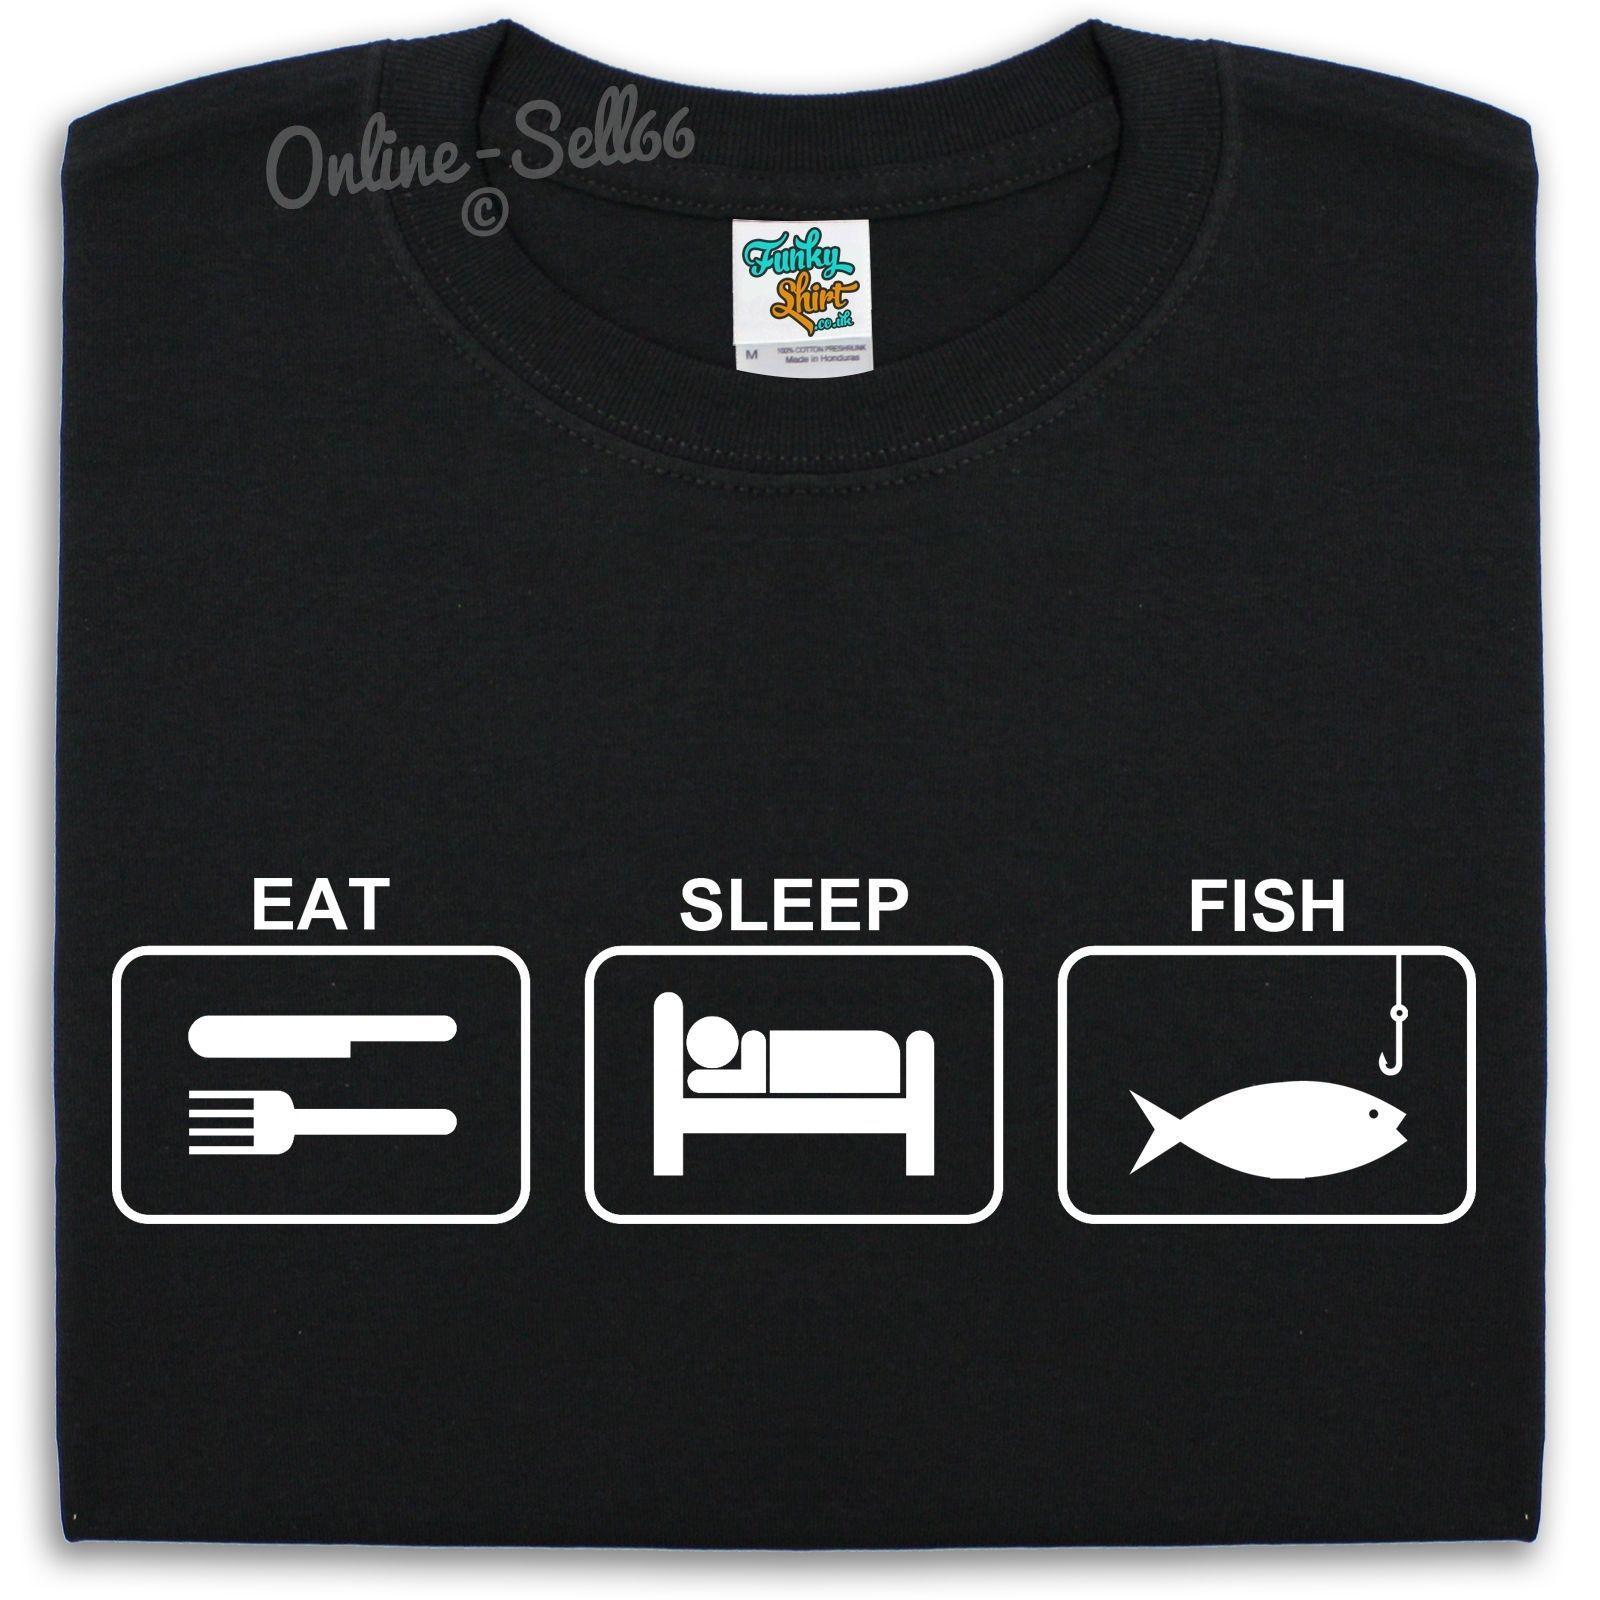 40f2ec00 Eat Sleep Fish T Shirt Mens Womens Kids Fishing Bait Night Fly Catch Fish  Rod Cool Casual Pride T Shirt Men Interesting Tee Shirts Shop For T Shirts  From ...